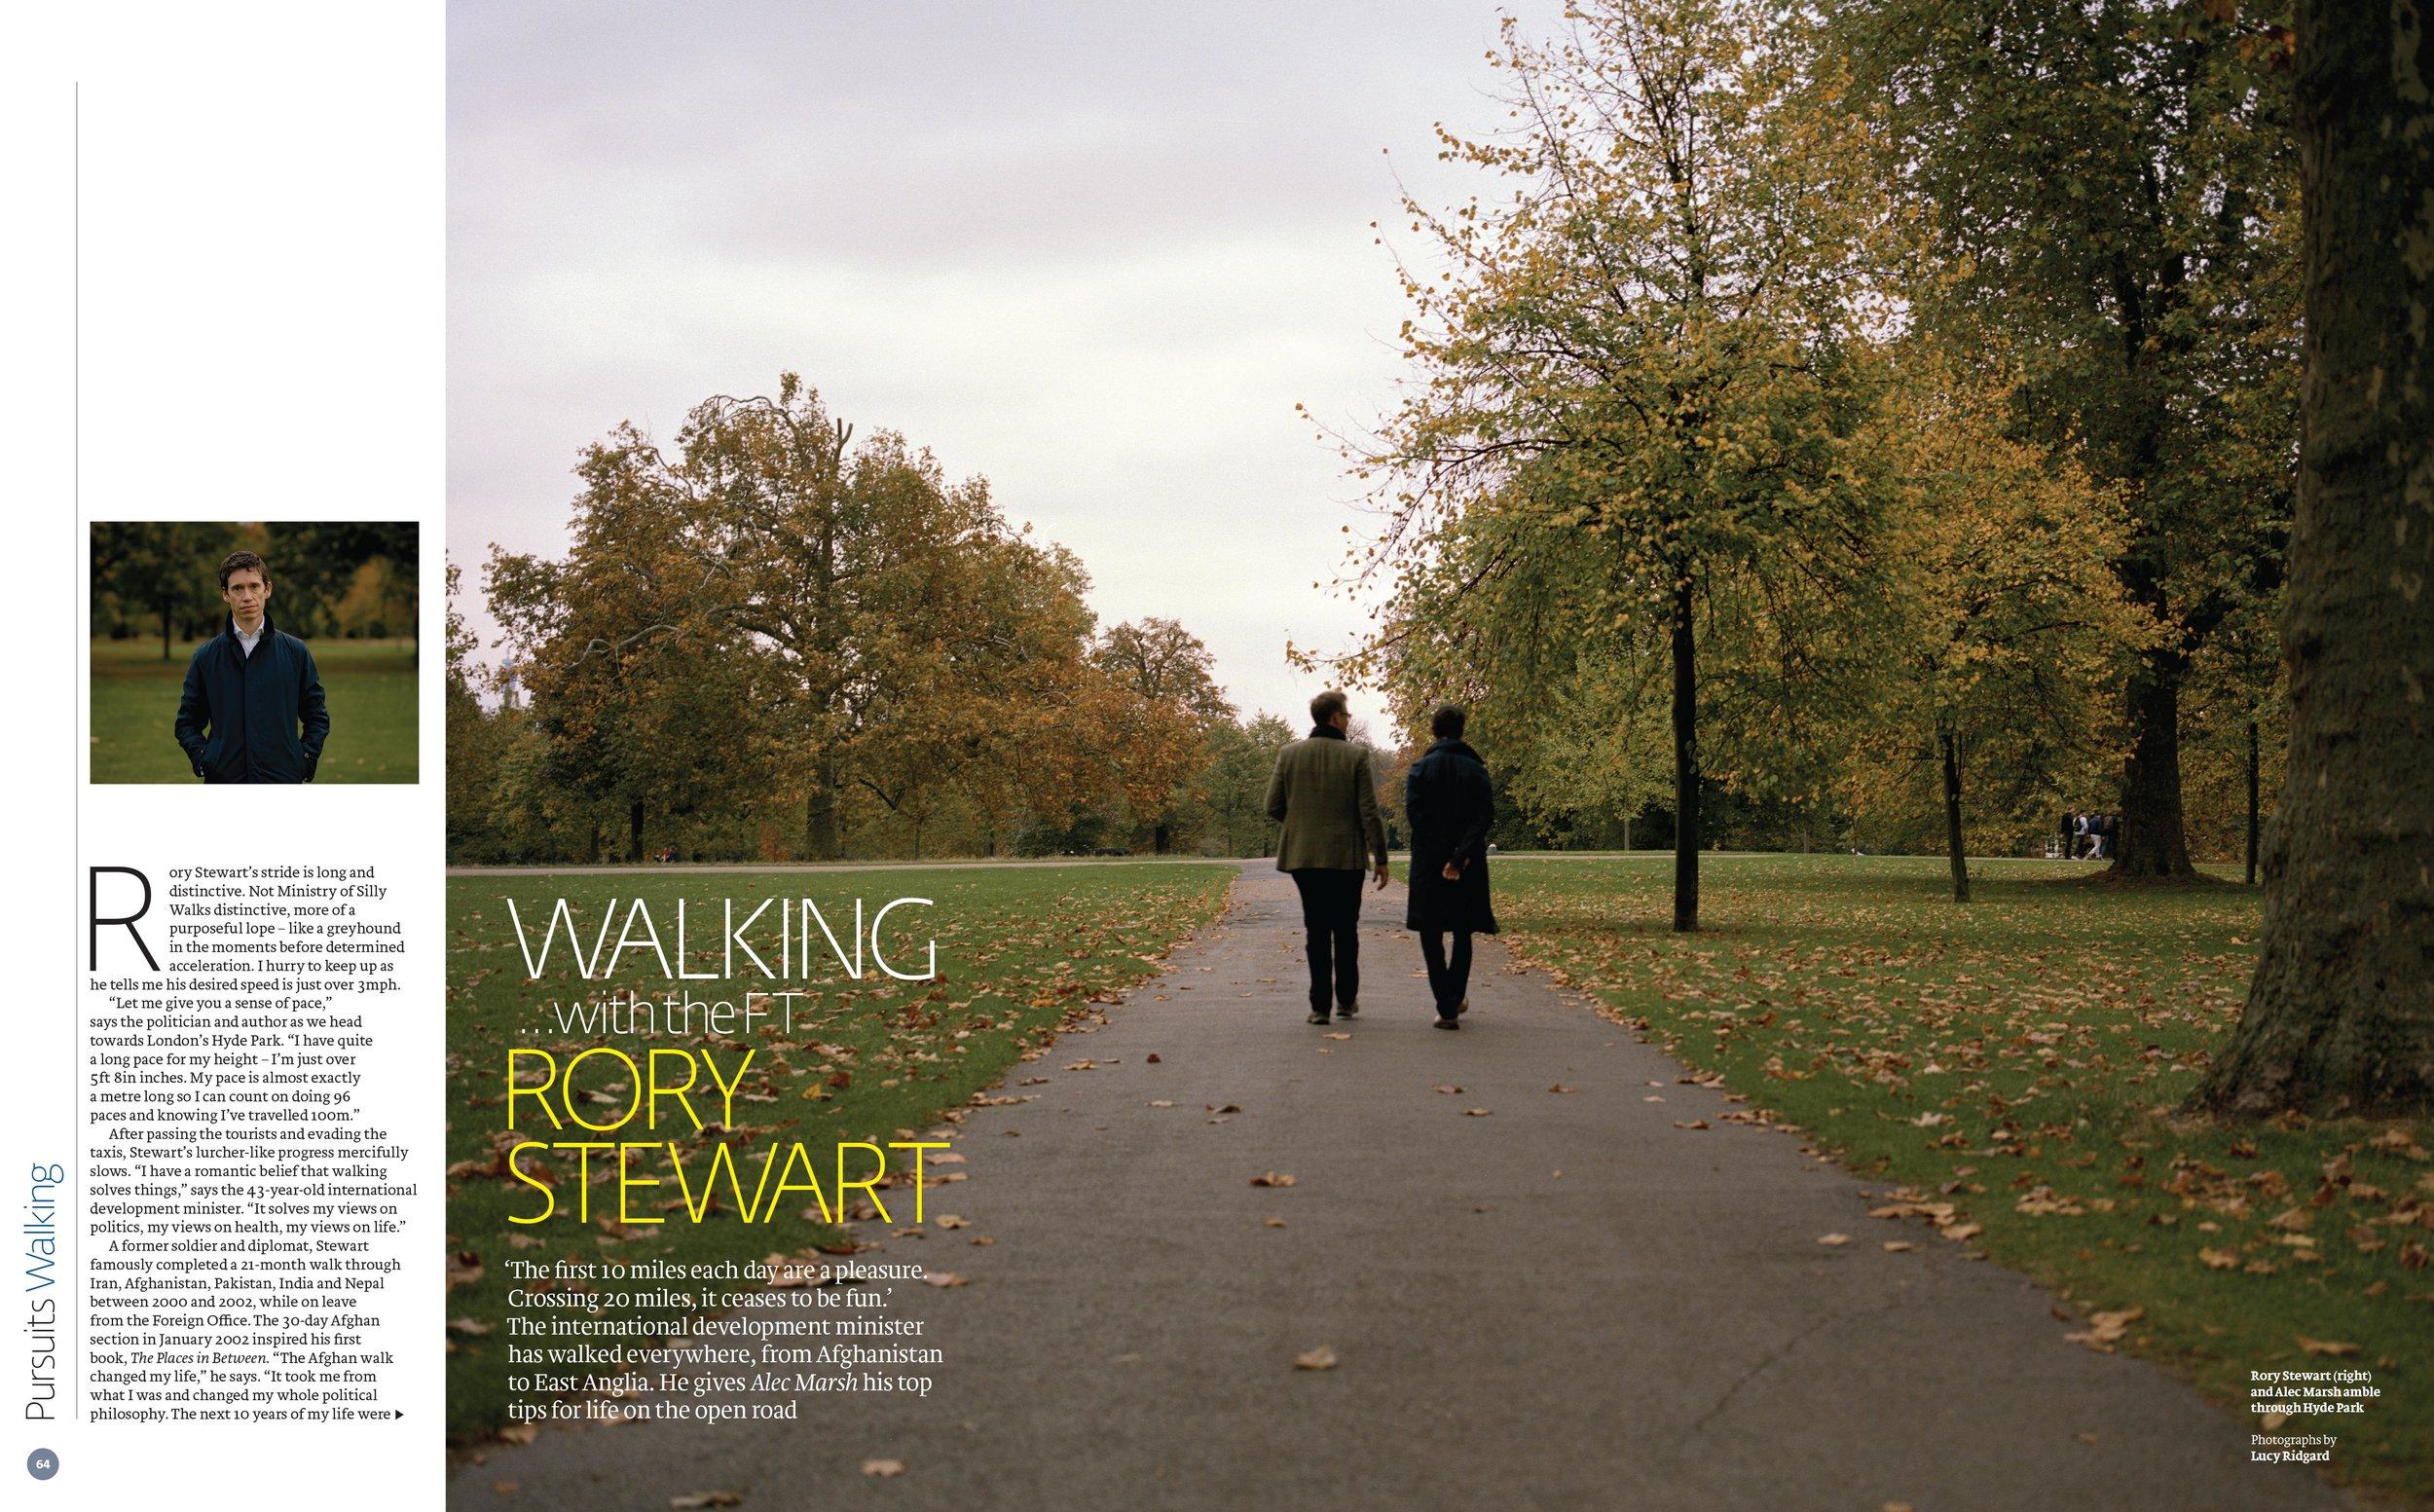 WalkingWithRoryStewart-1.jpg